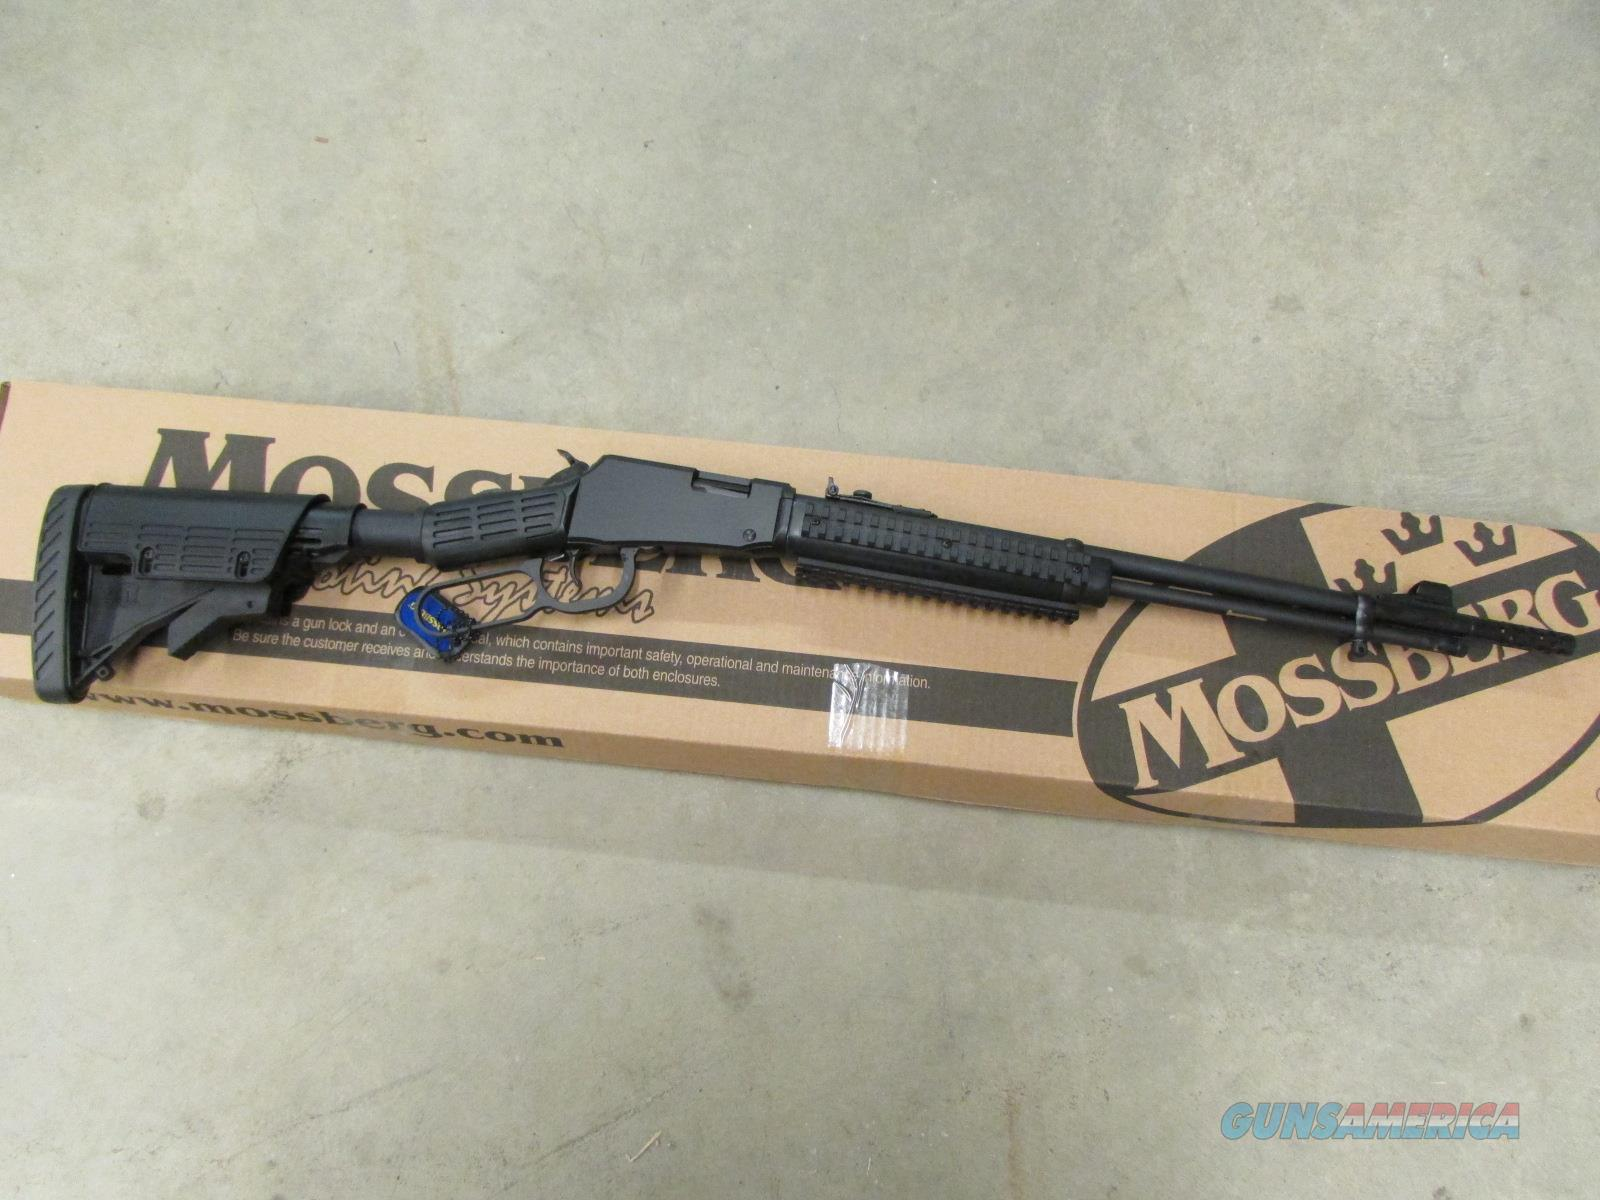 Mossberg 464 SPX Tactical Lever-Action .22 LR 43027  Guns > Rifles > Mossberg Rifles > Lever Action